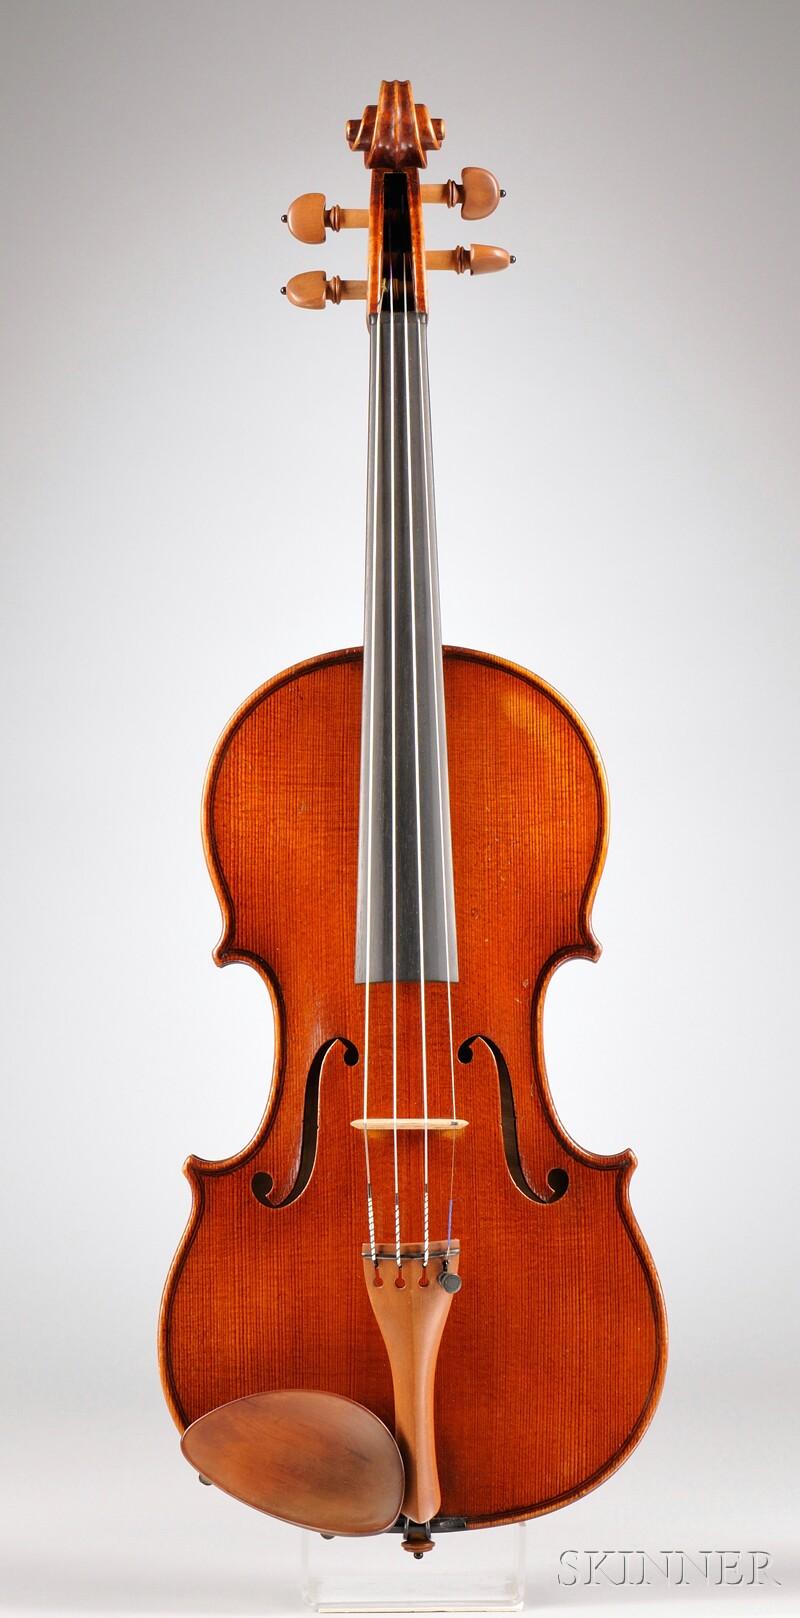 Modern German Violin, Ludwig Glaesel, Jr., Markneukirchen, 1925